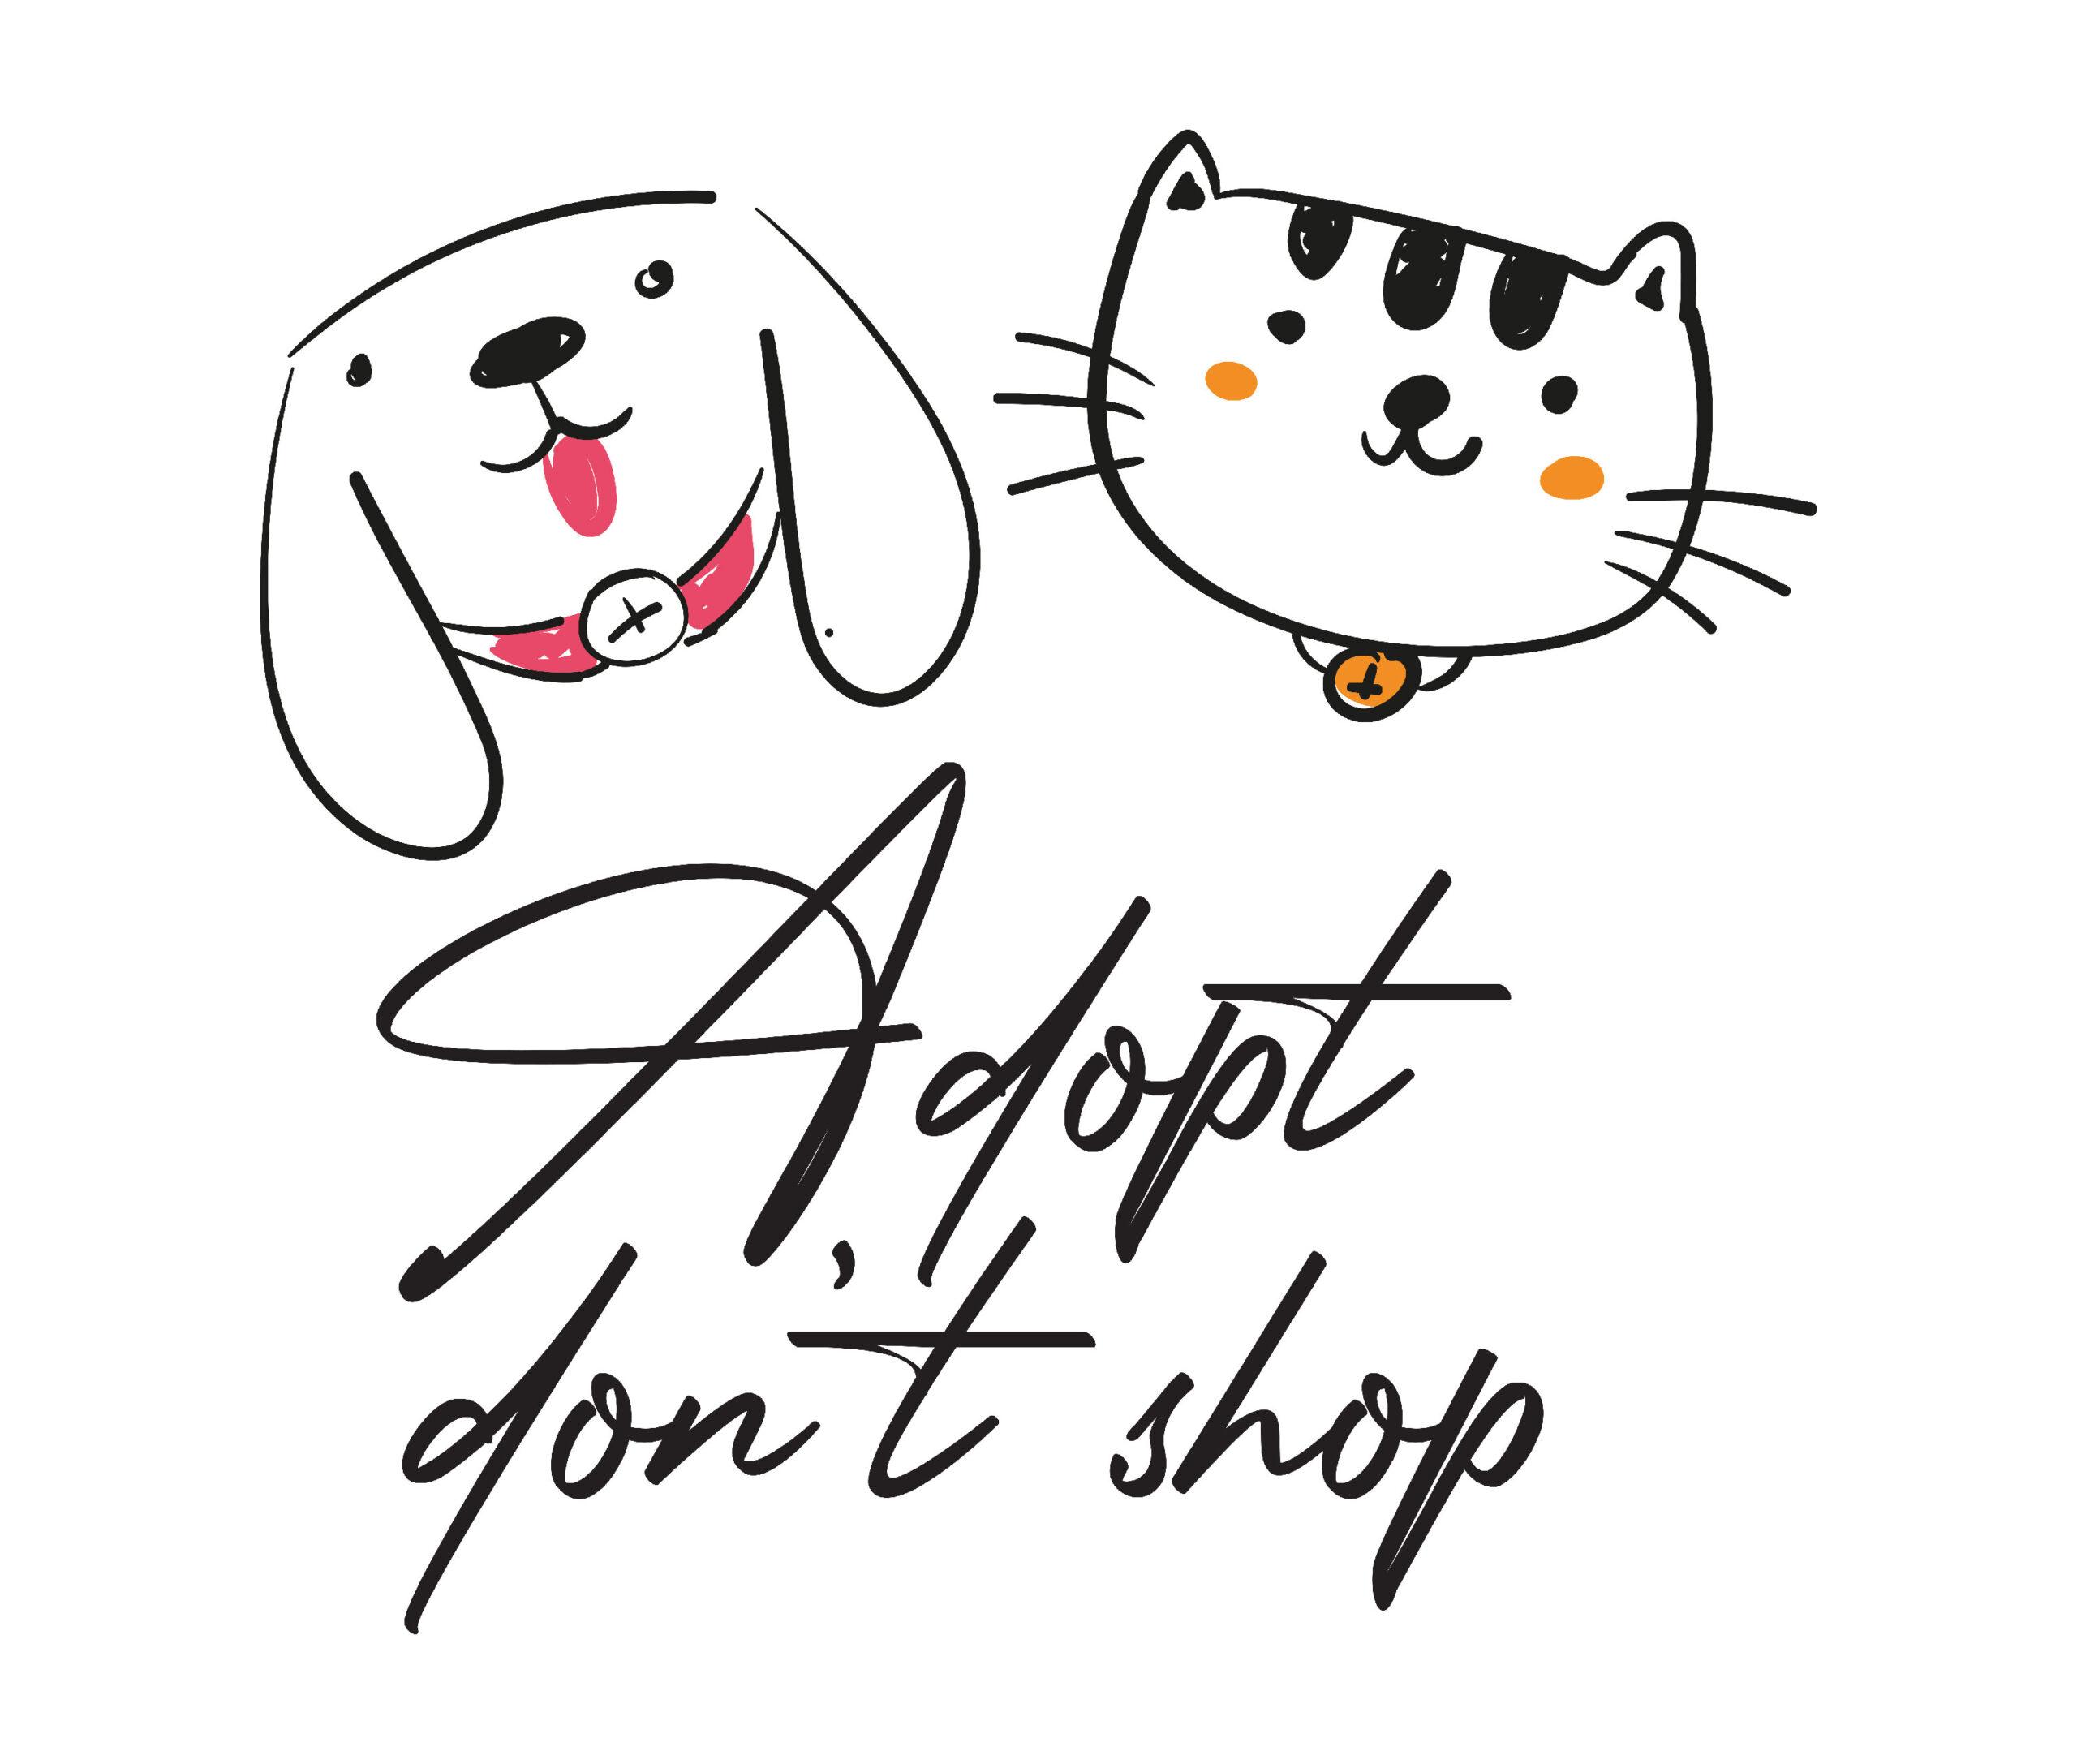 Adopt dont shop